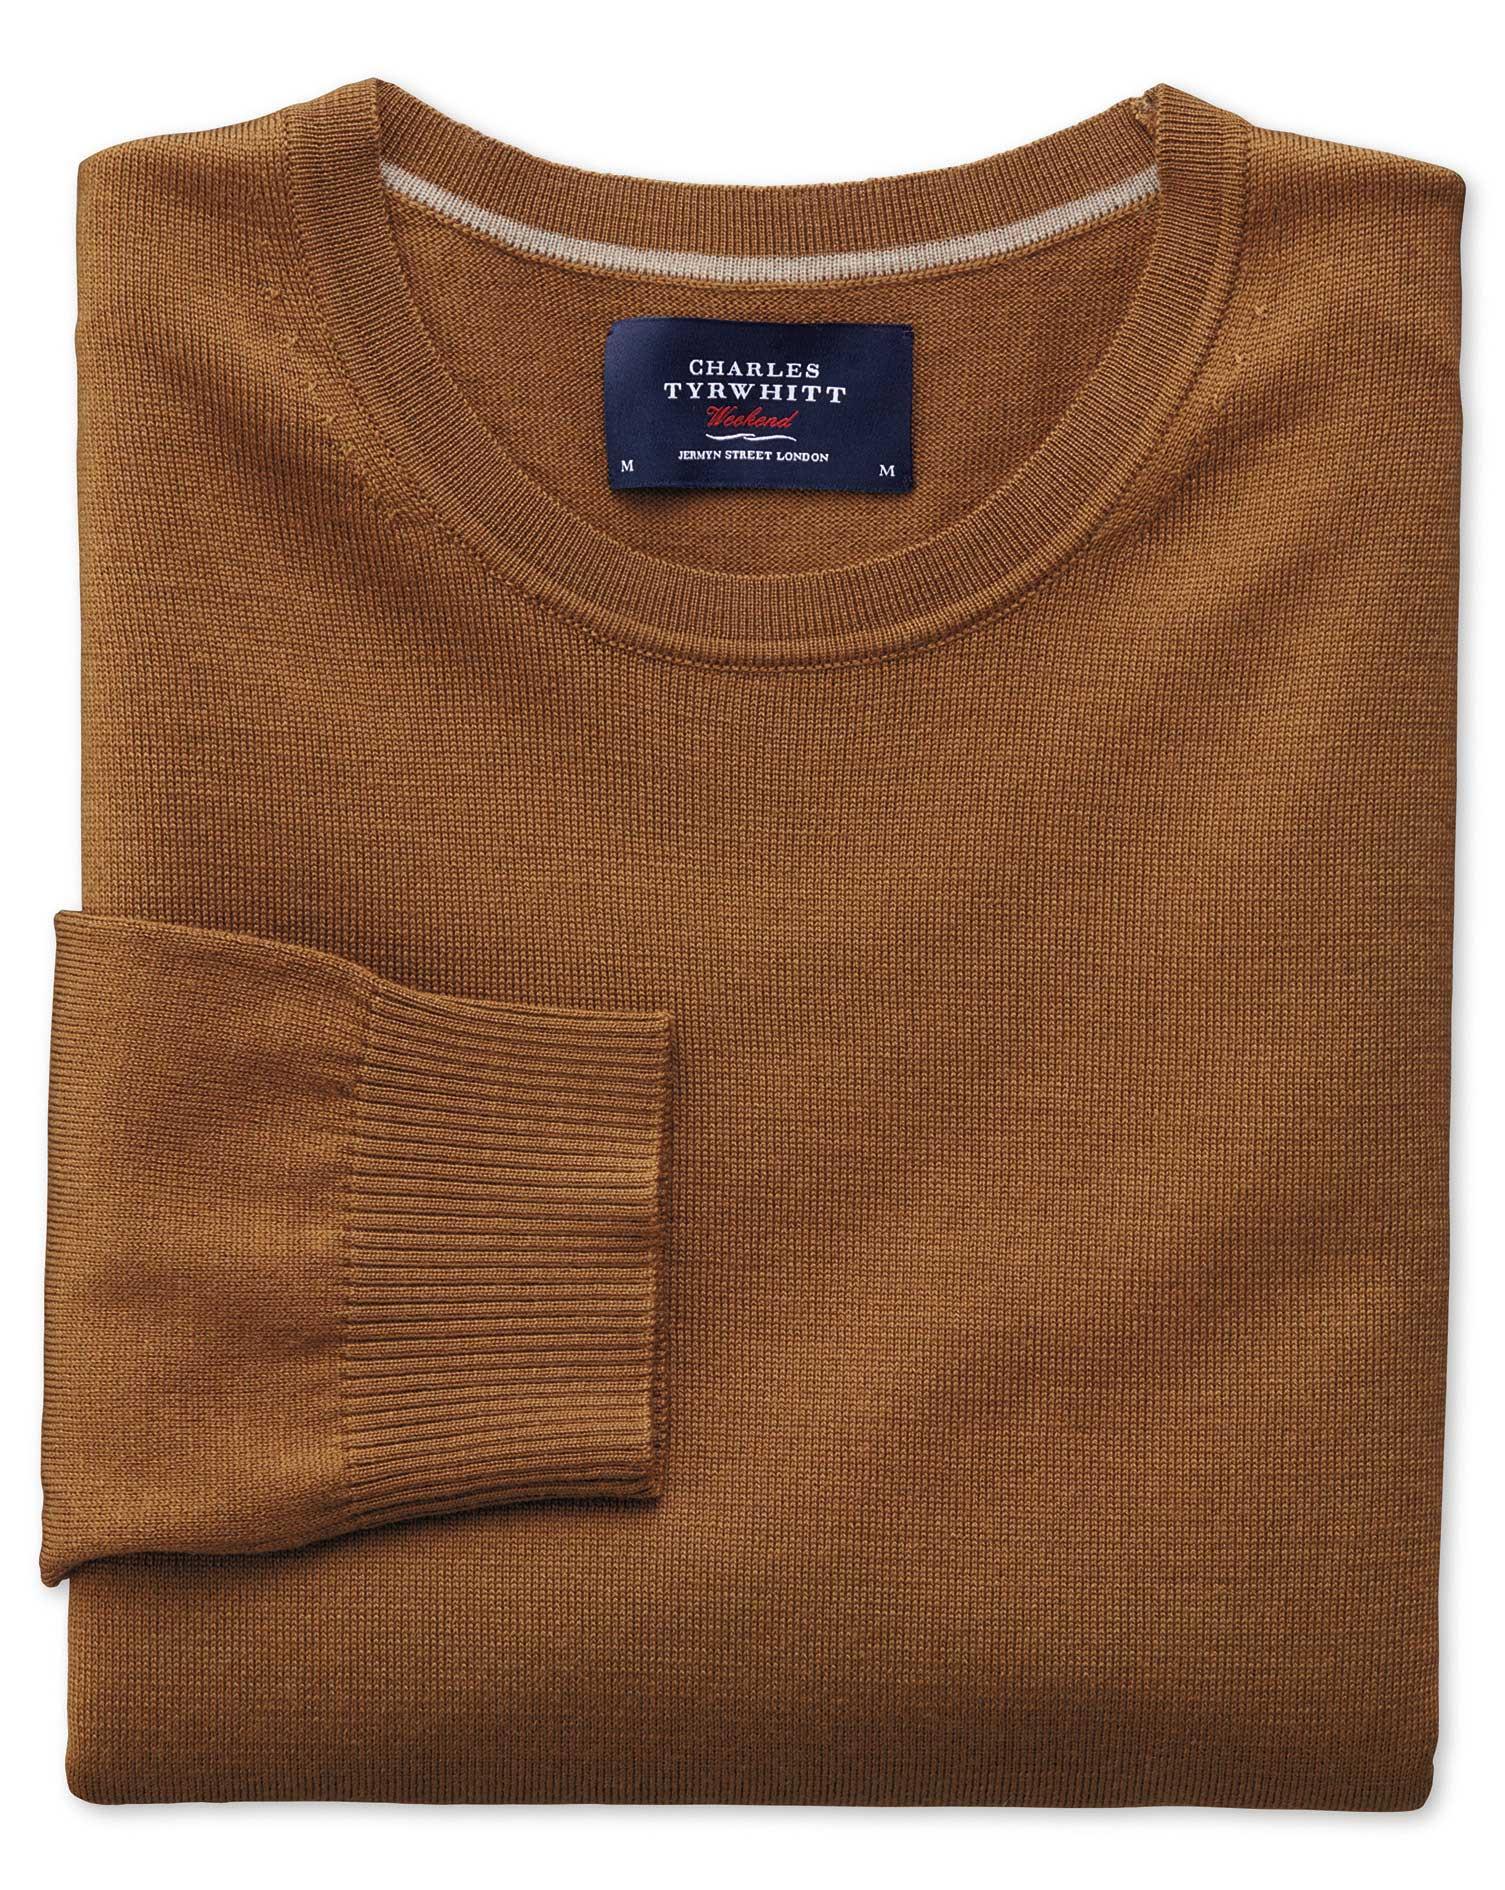 Tan Merino Wool Crew Neck Jumper Size Large by Charles Tyrwhitt